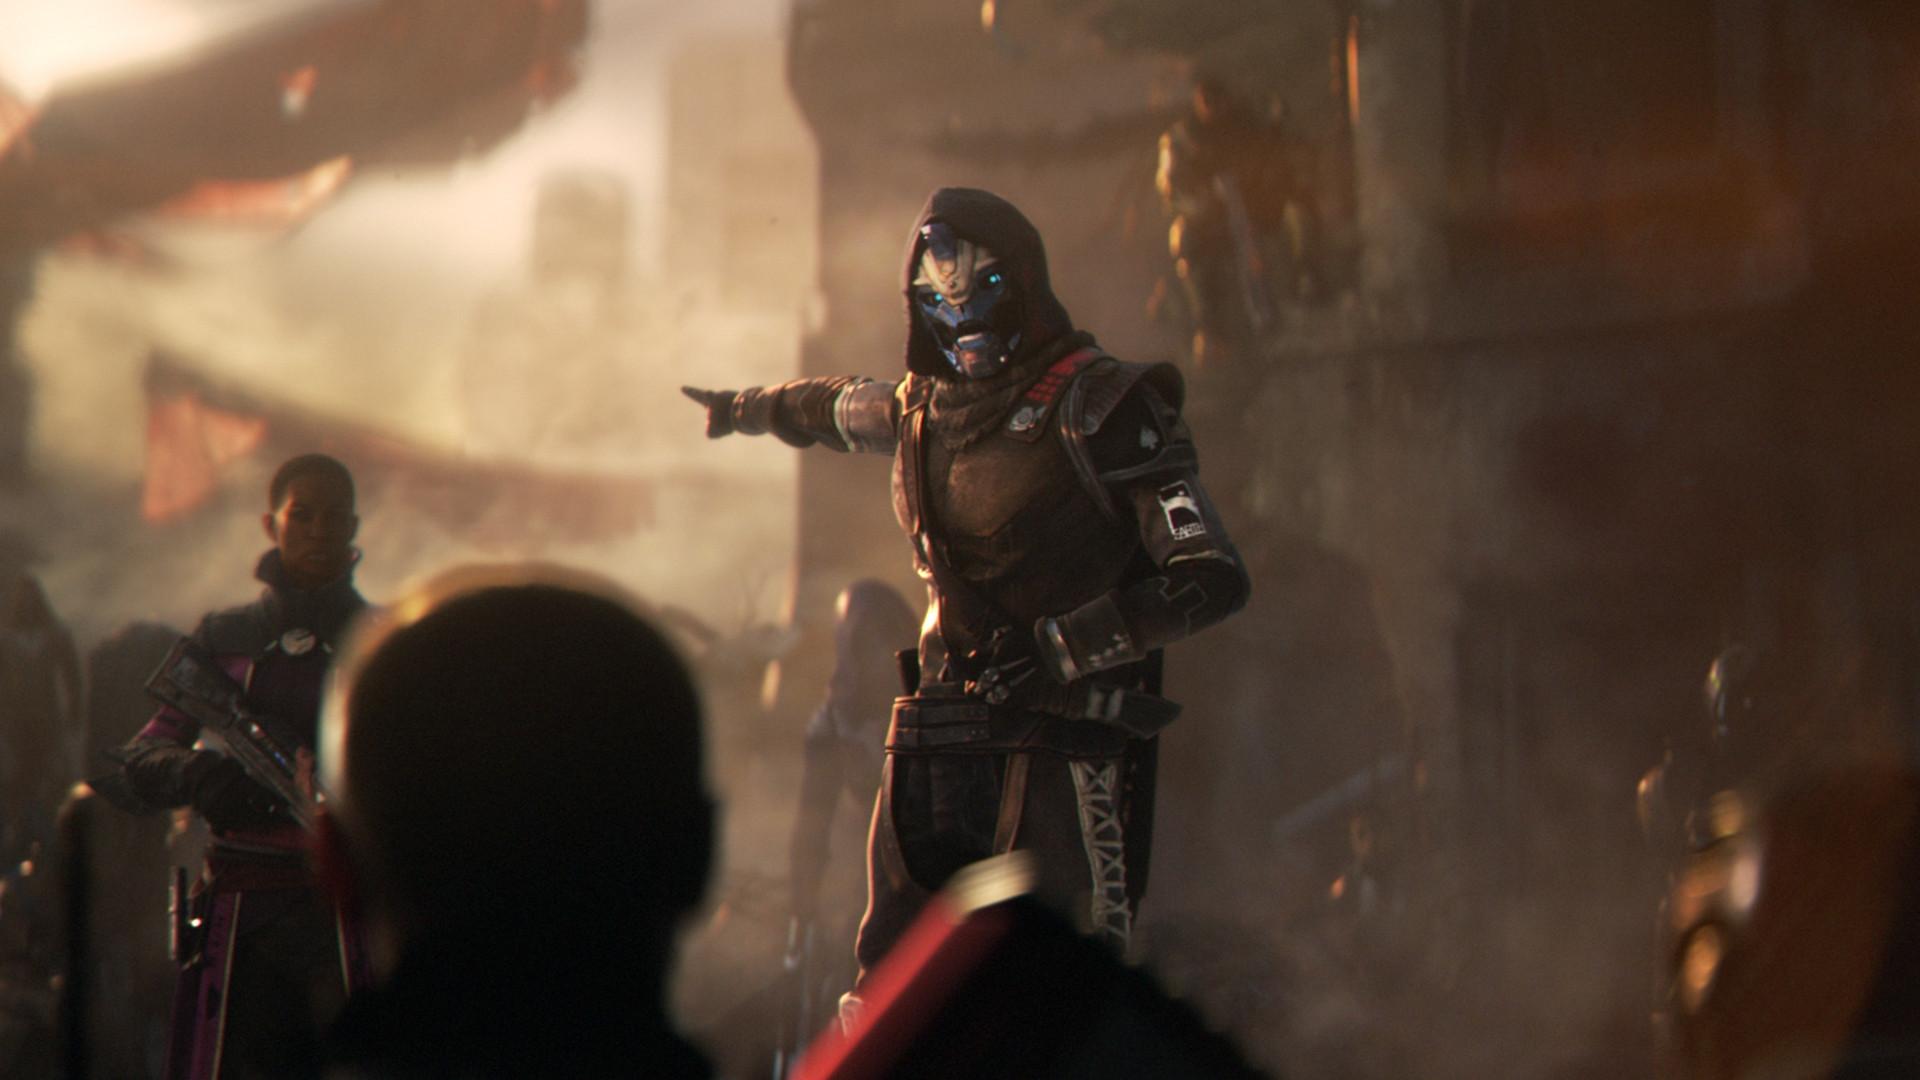 Destiny-2-Six-walkthrough-guide-How-to-kill-Fallen-Captain-Jaliks